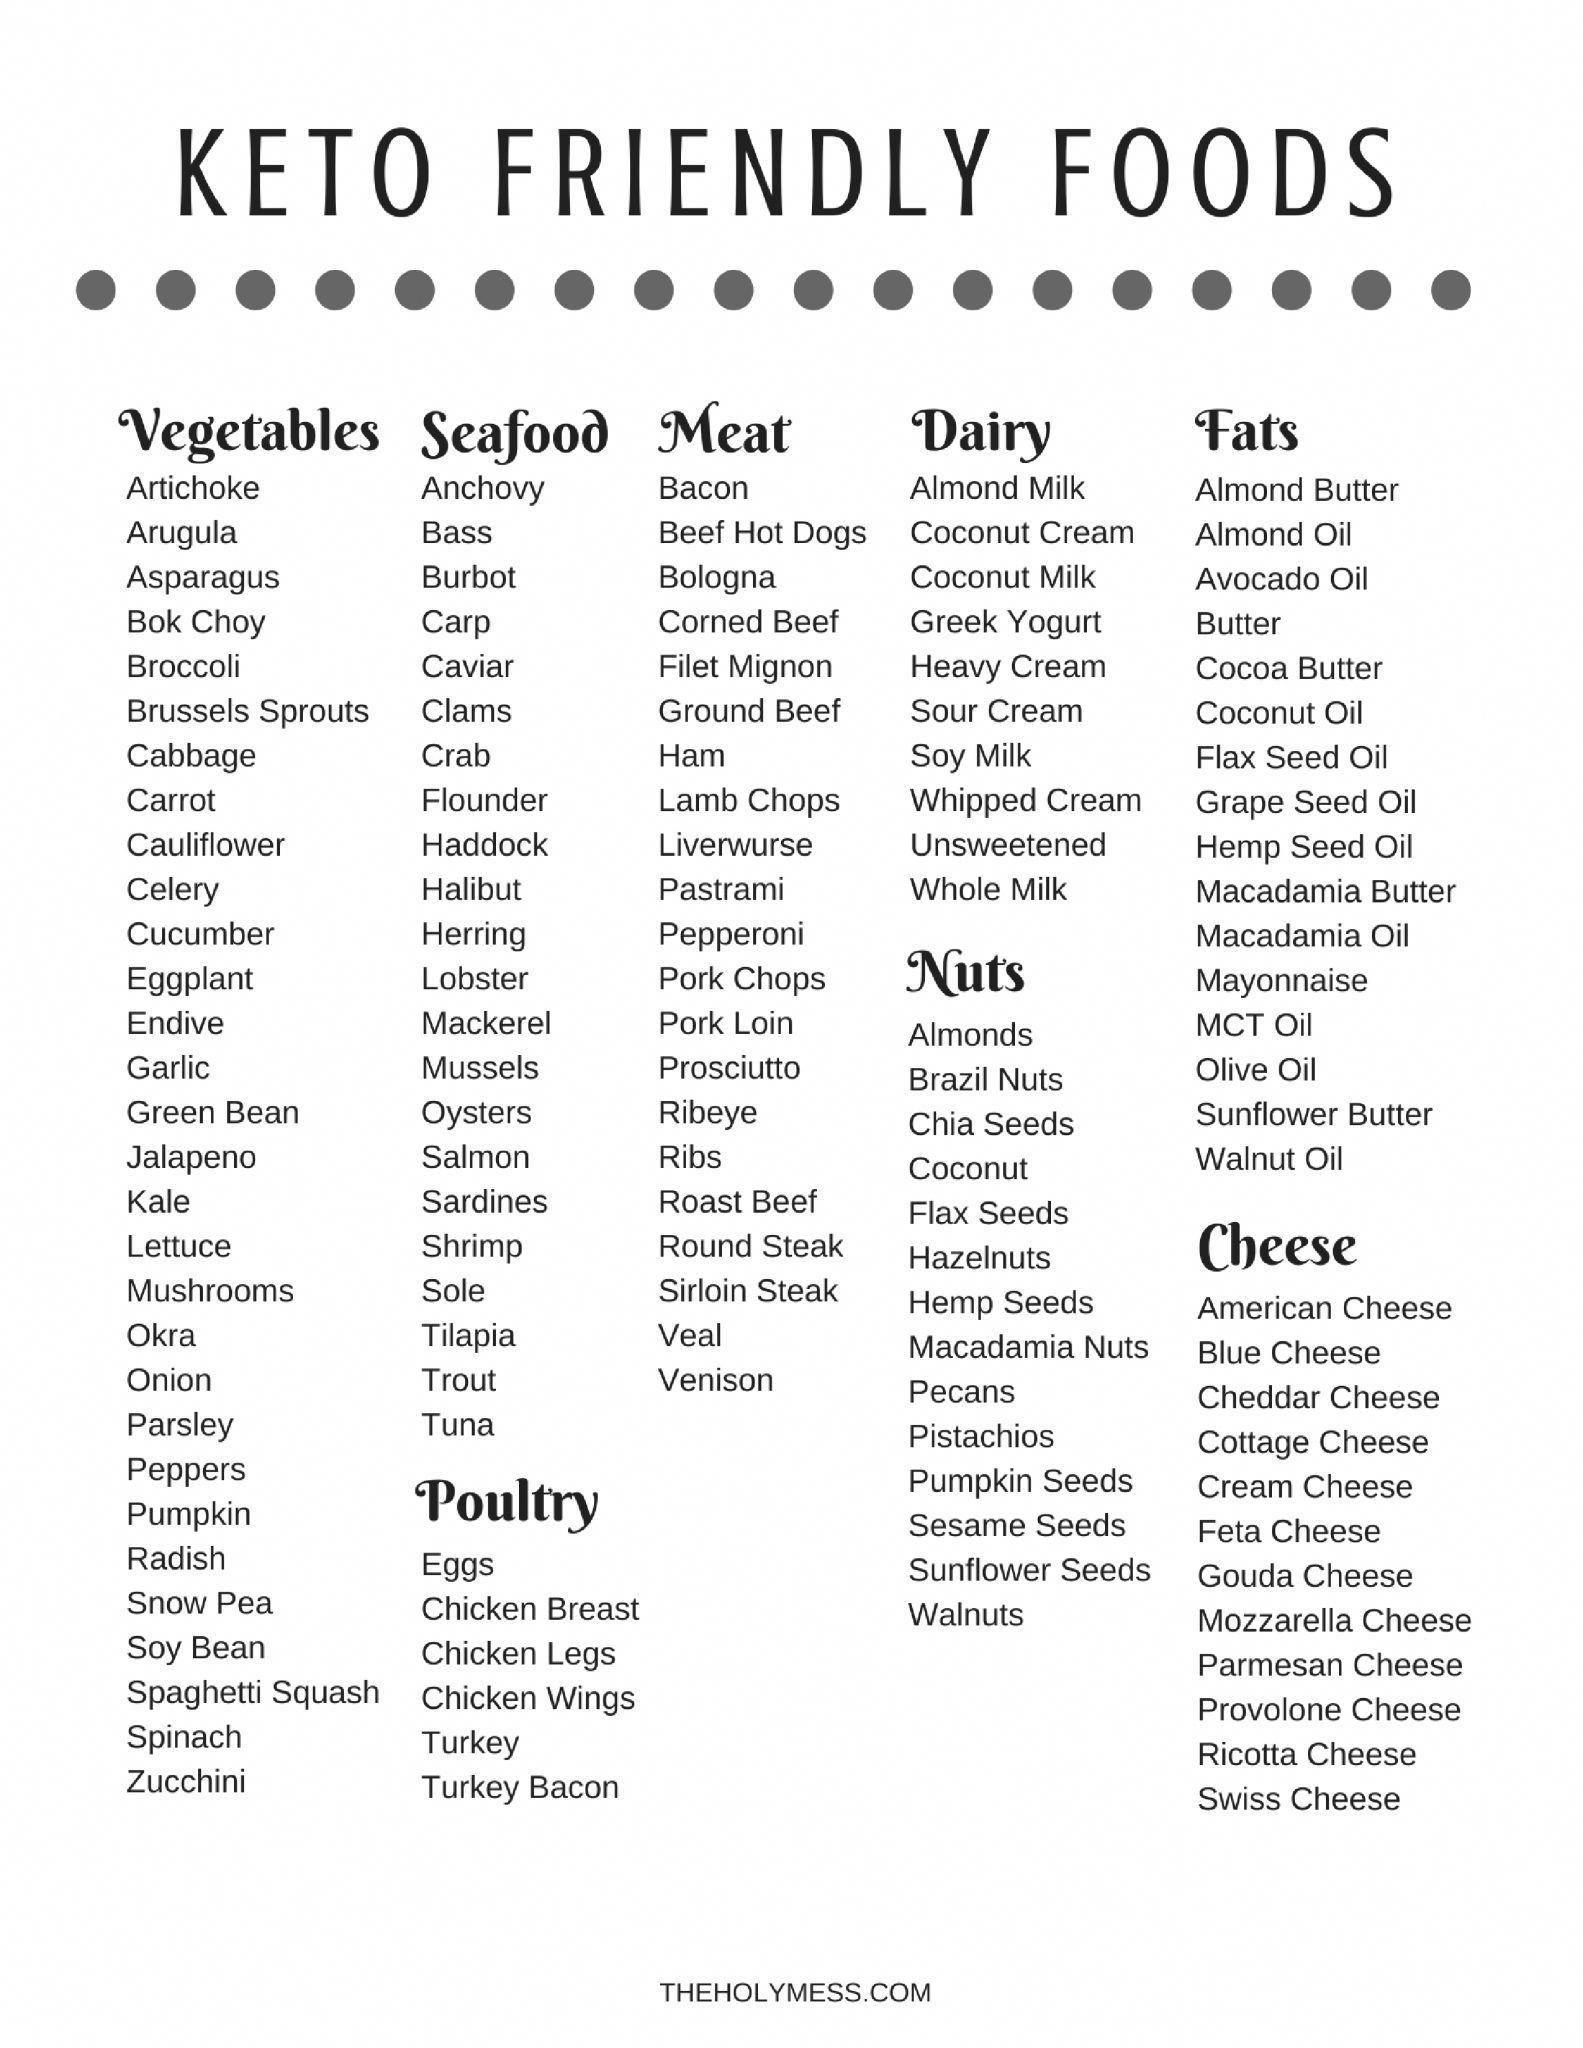 Free Printable Keto Friendly Food List Healthyfoodlist